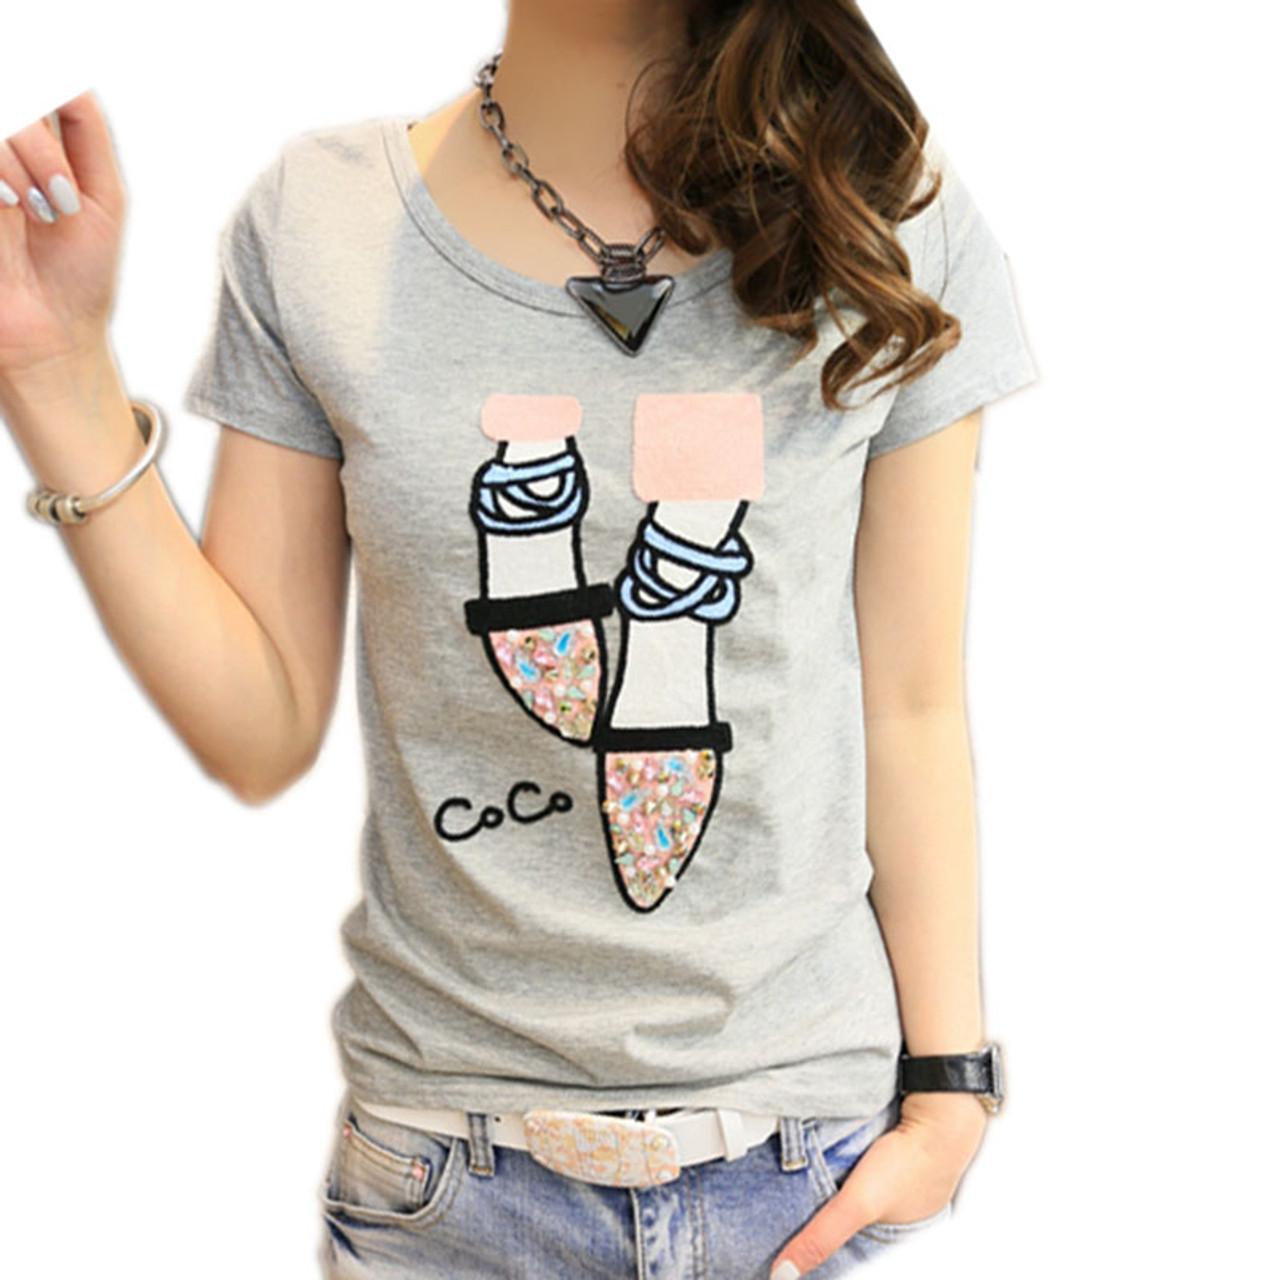 c23144e77e2 BOBOKATEER T shirt women t-shirt cotton top tee shirt femme kawaii tshirt  women tops summer t-shirts camisetas mujer verano 2018 - OnshopDeals.Com